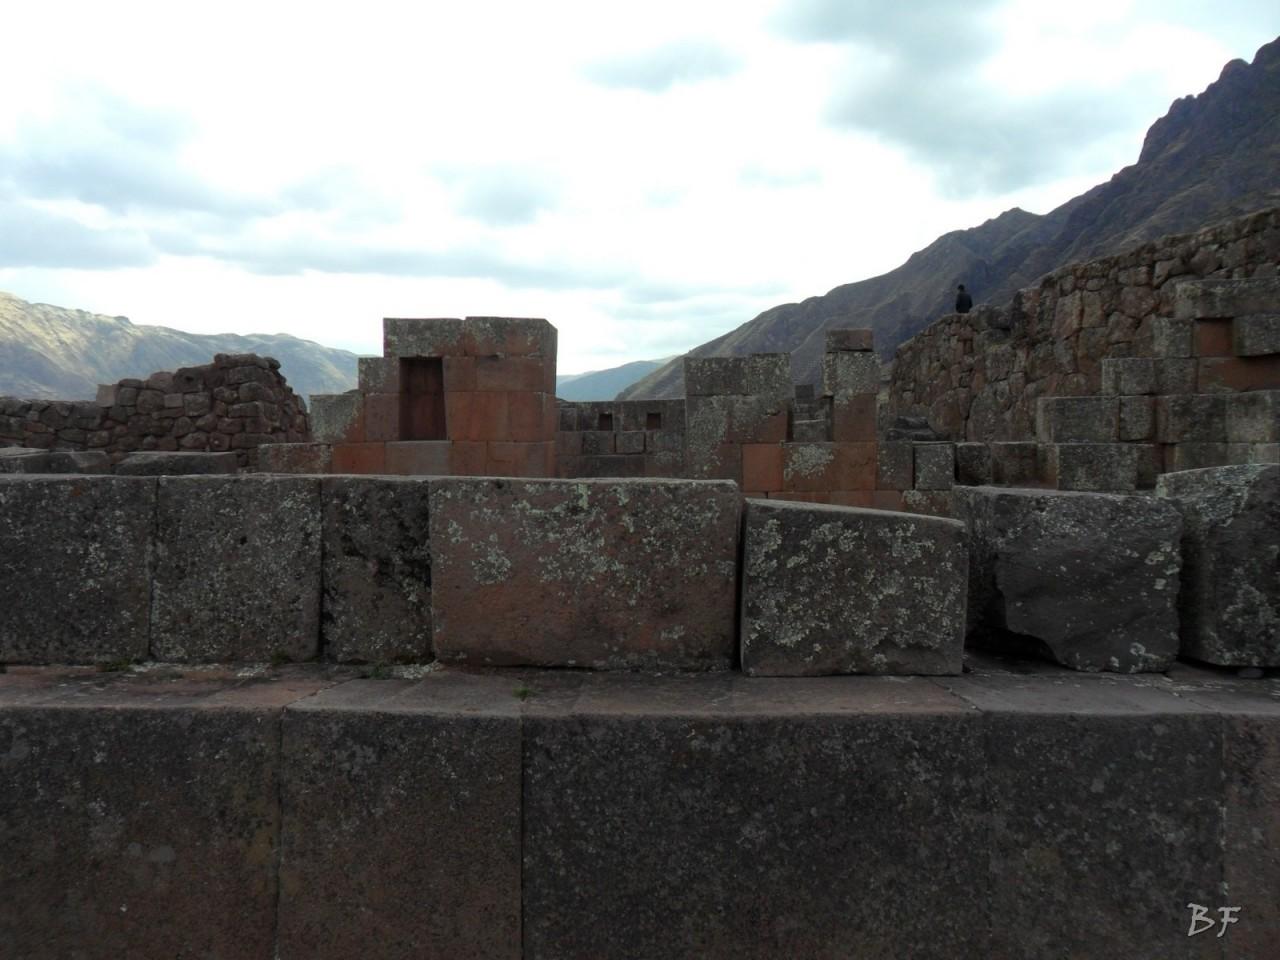 Mura-Poligonali-Megaliti-Altari-Rupestri-Pisac-Cusco-Perù-53